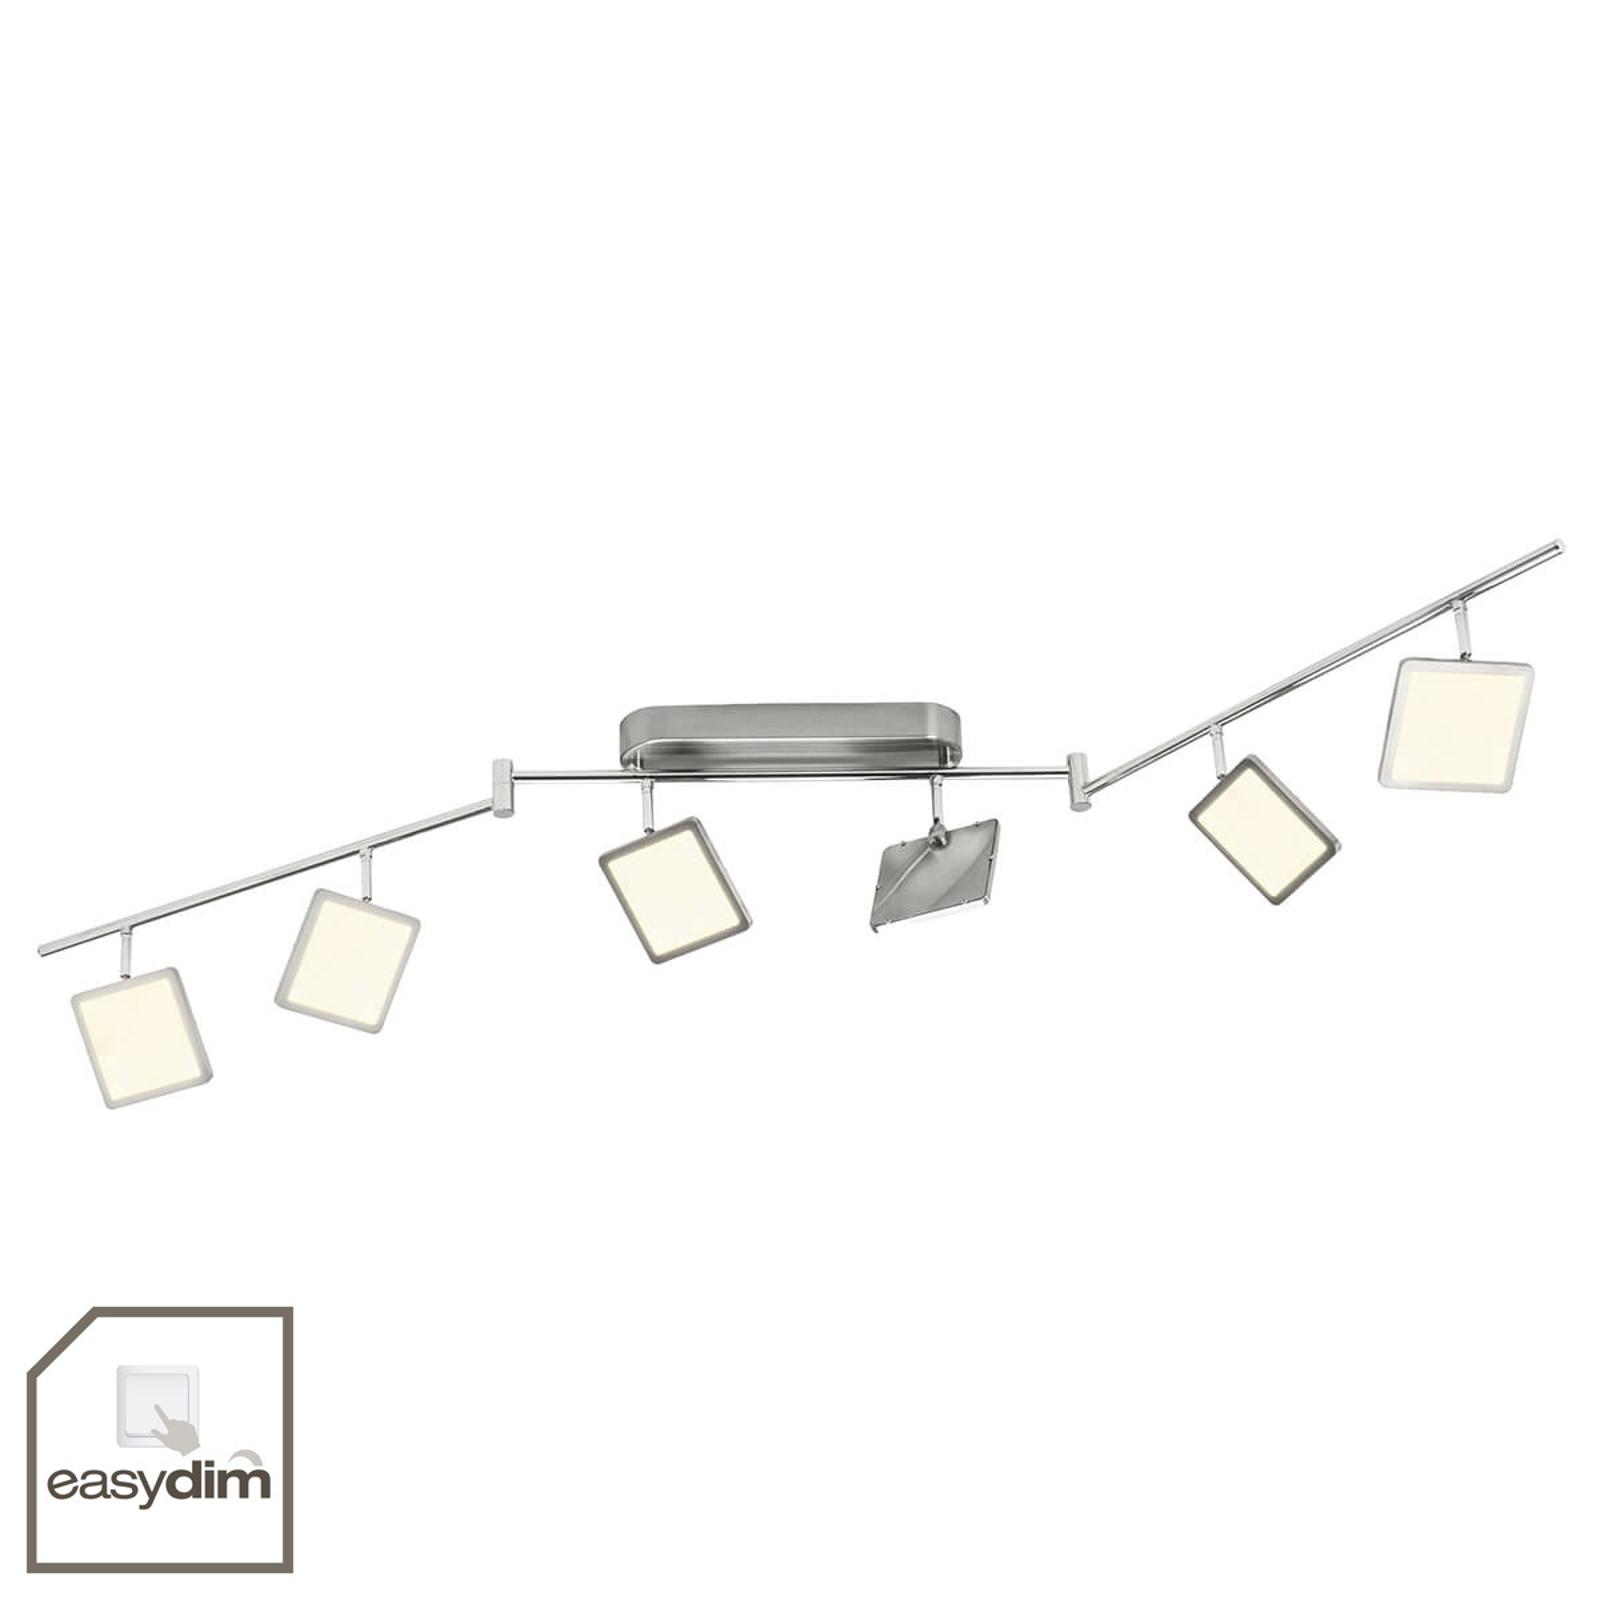 Easydim-taklampa Uranus, LED, 6 ljuskällor